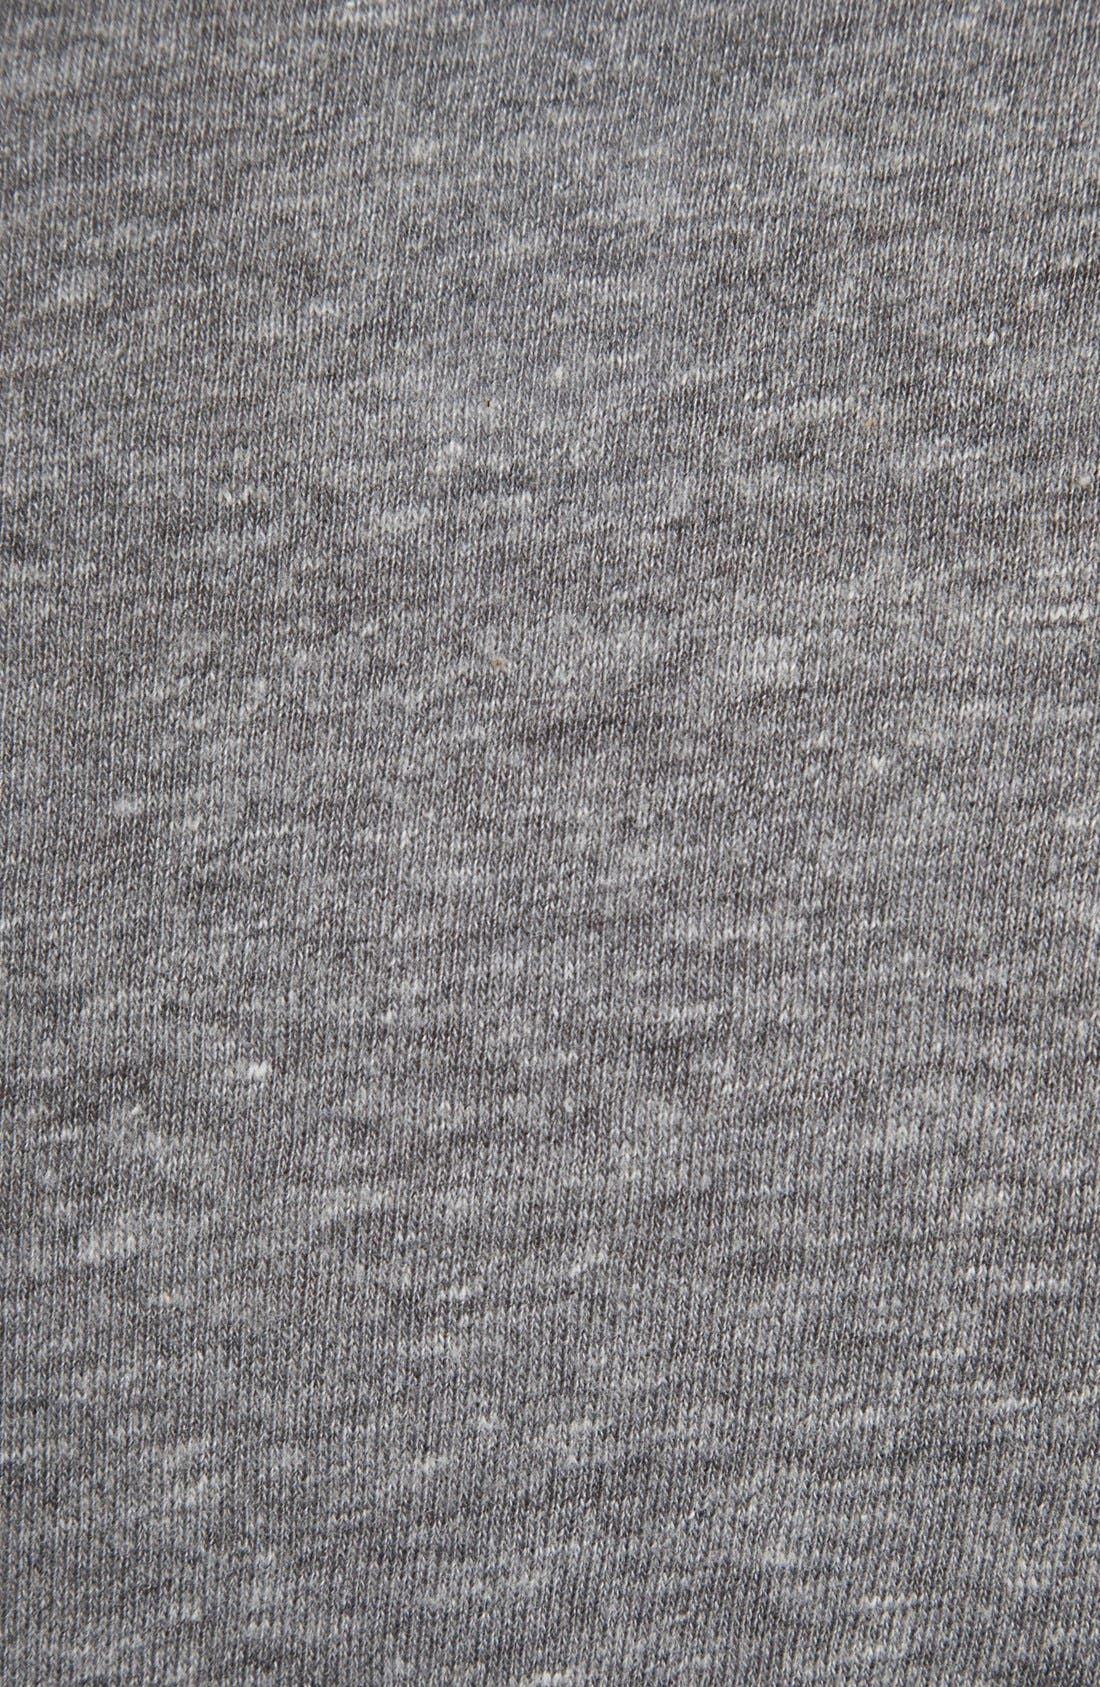 Alternate Image 3  - Junk Food 'Touchdown - Tampa Bay Buccaneers' T-Shirt